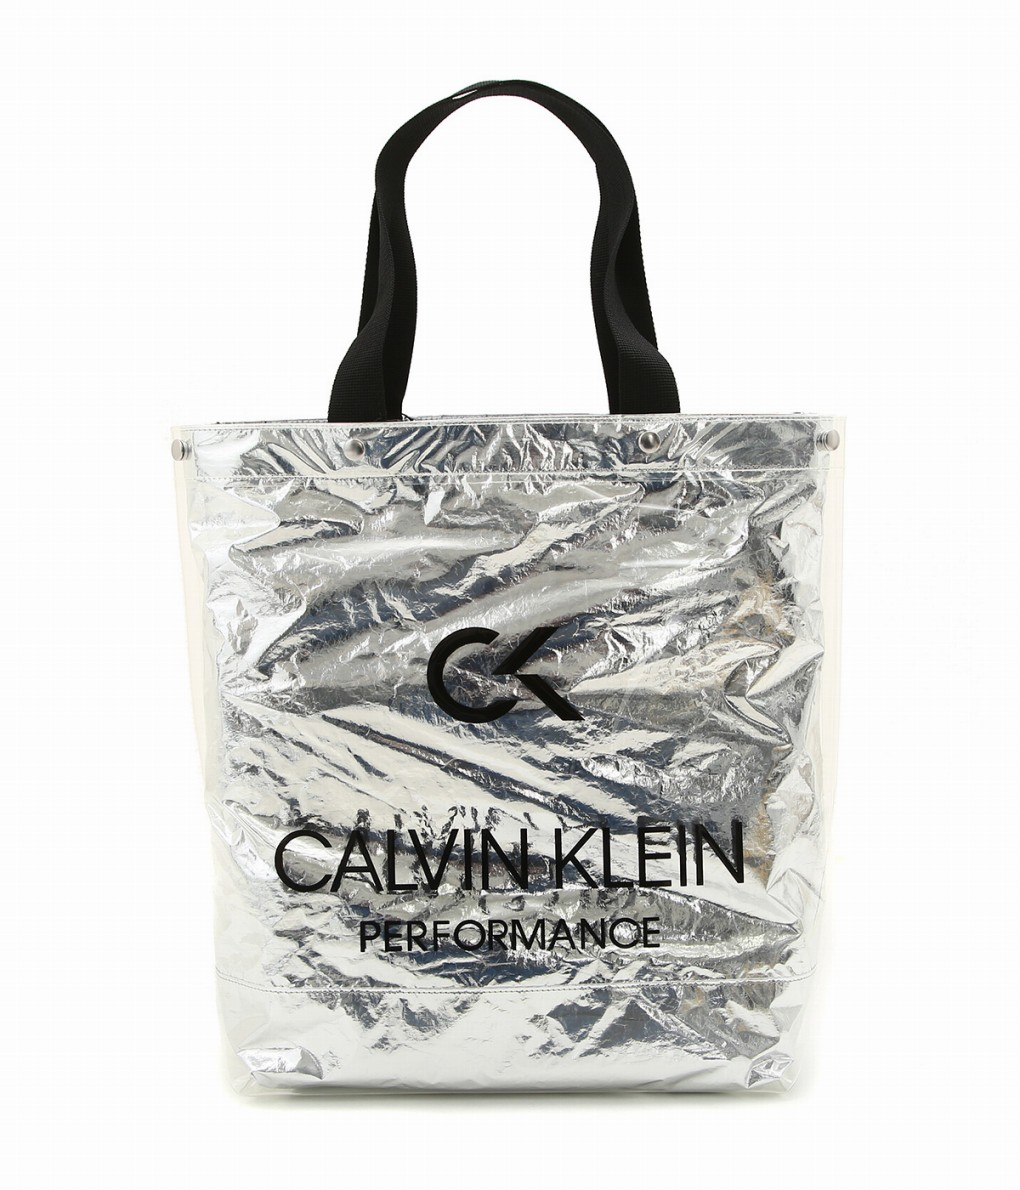 CALVIN KLEIN PERFORMANCE / カルバンクラインパフォーマンス : CK PERFORMANCE TOTE BAG - S : バッグ カルバンクライン カルヴァンクライン CK レディース : CKP-1908018【DEA】